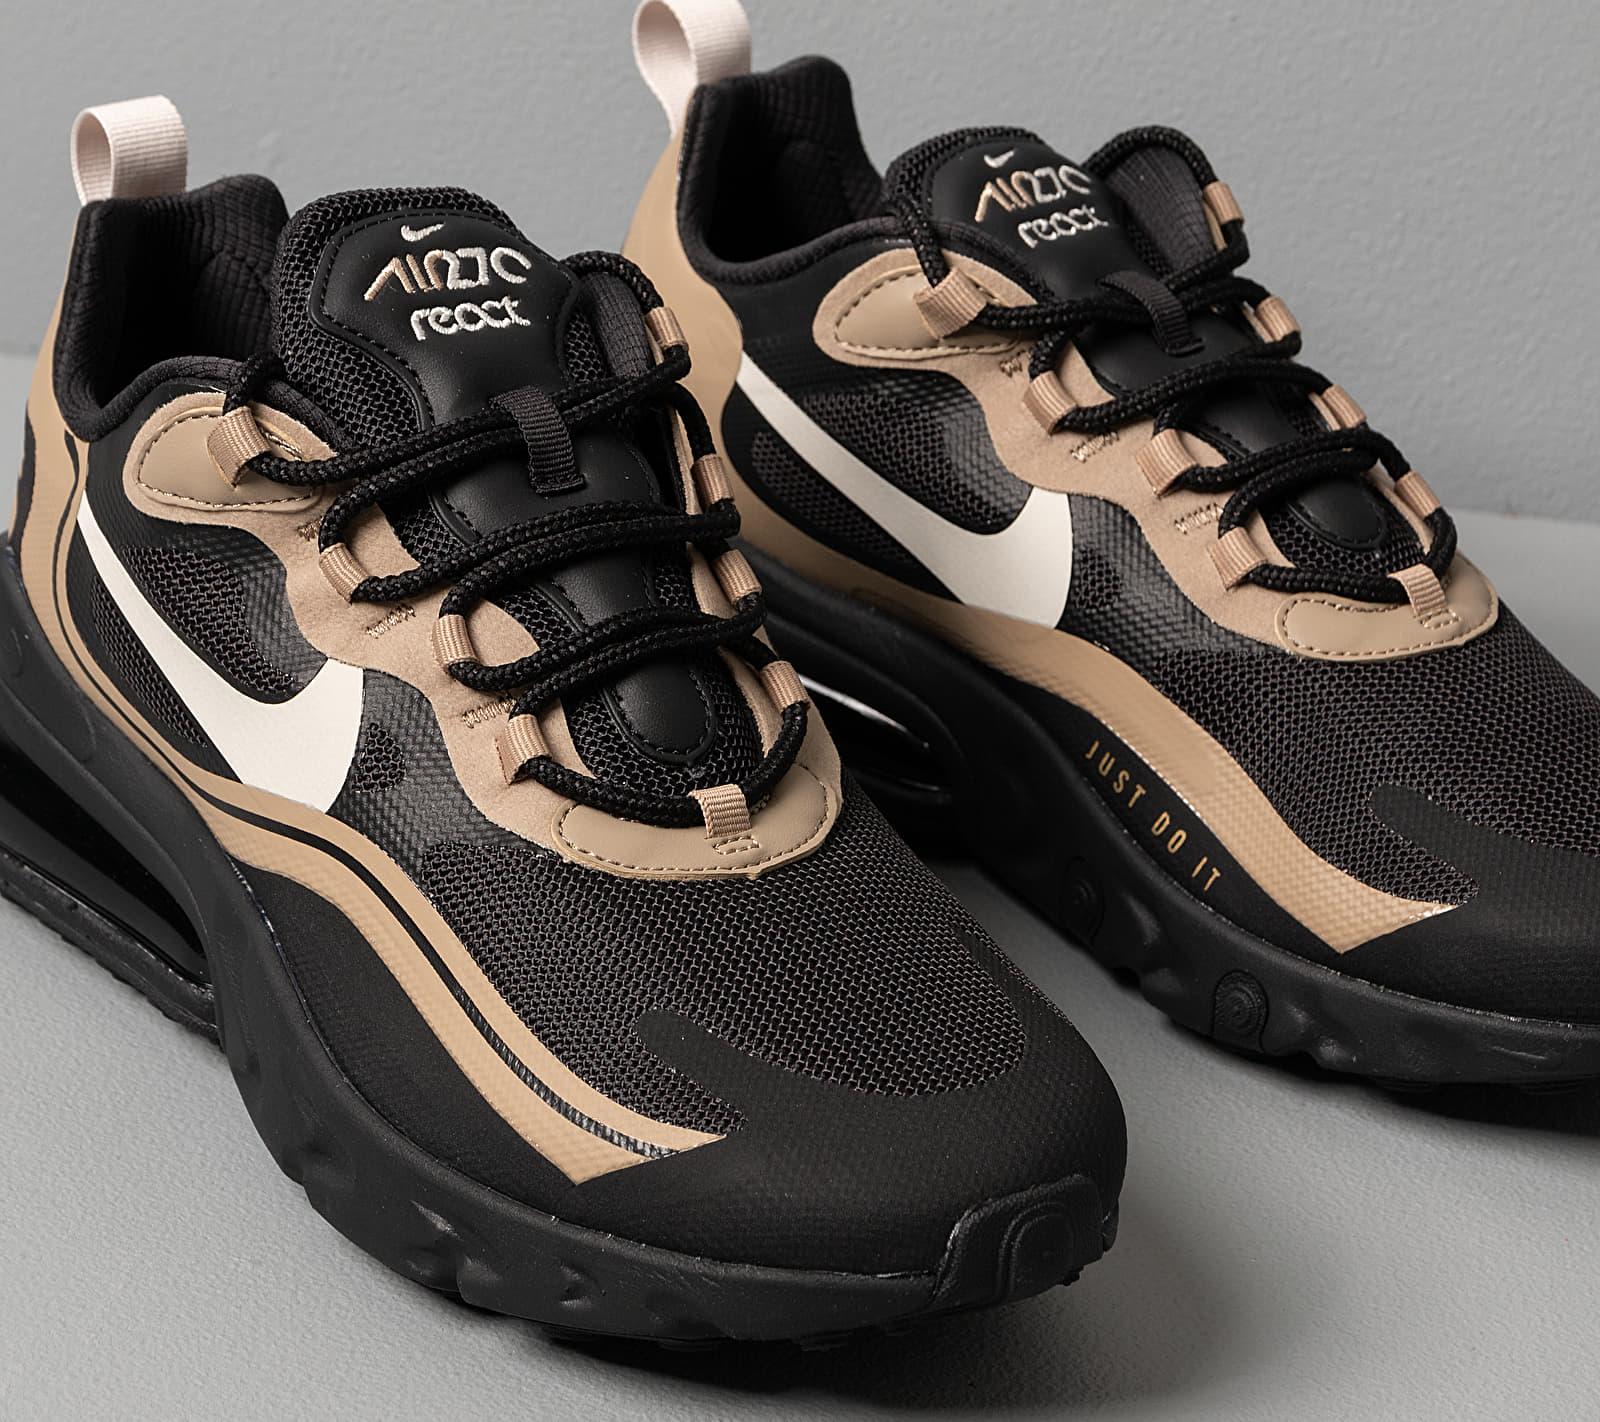 Nike Air Max 270 React Black Light Bone Khaki Metallic Gold